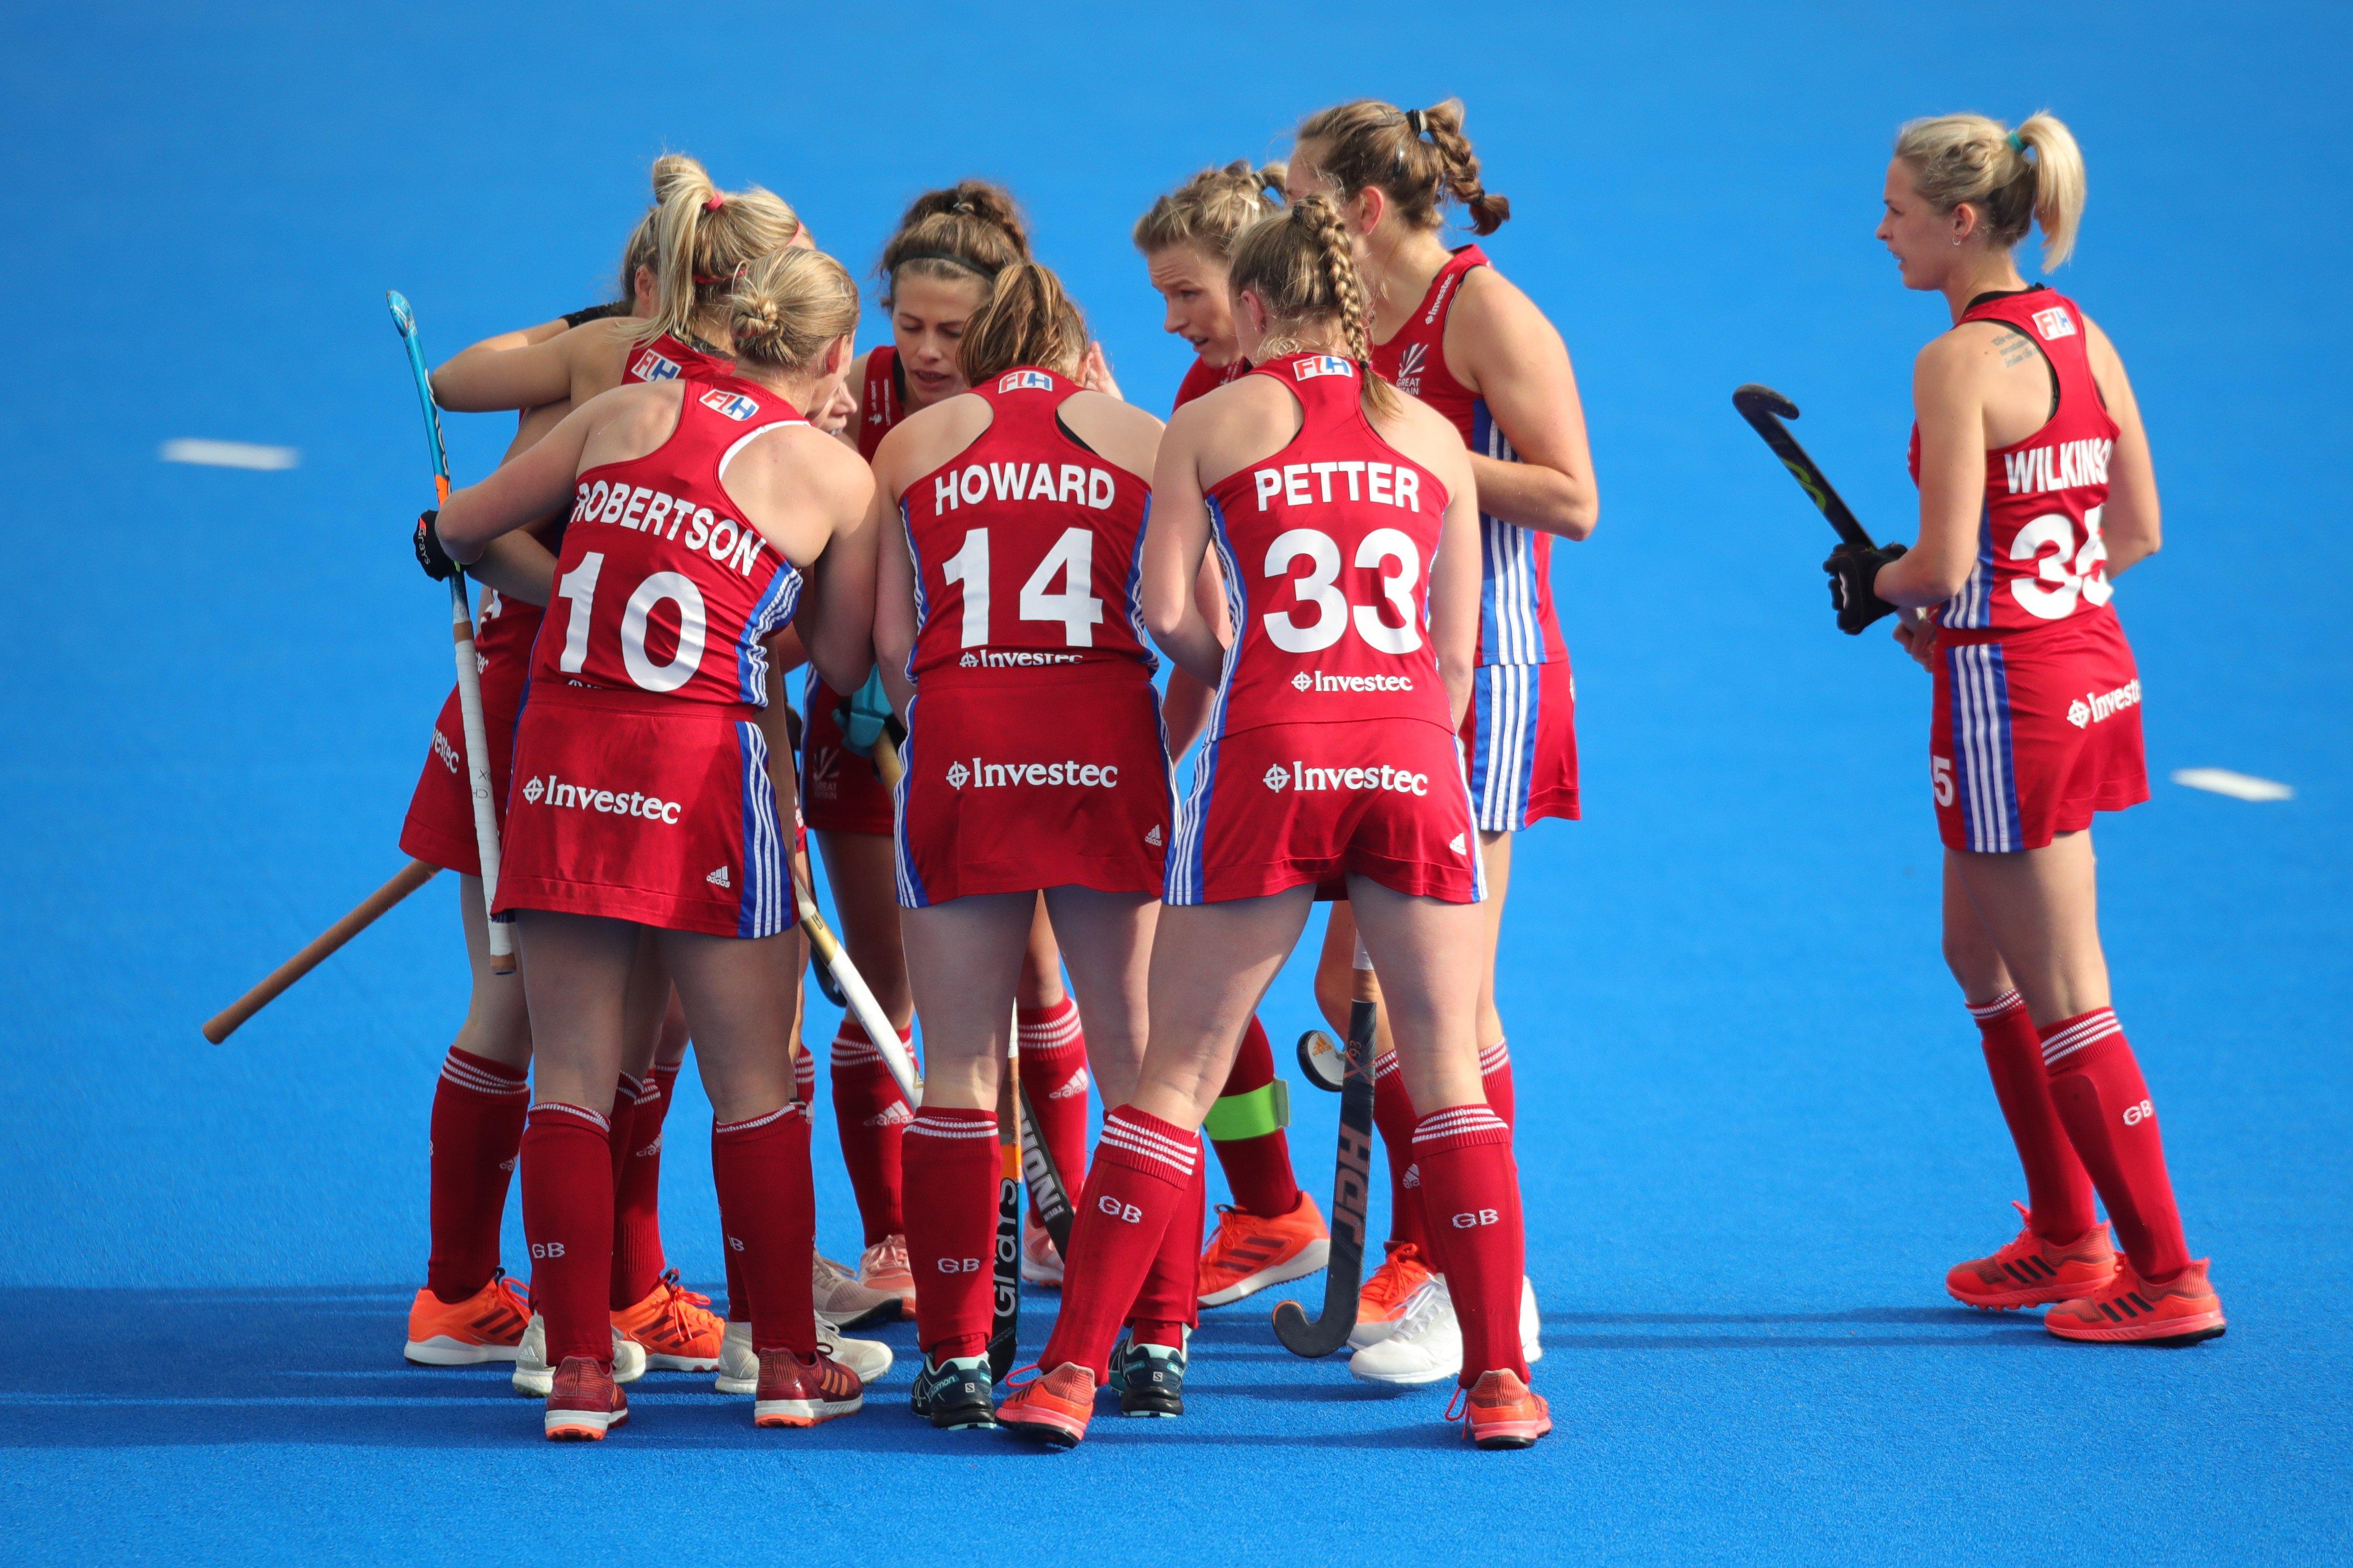 Great Britain women's hockey team sets up fundraiser to help Australian bushfire relief